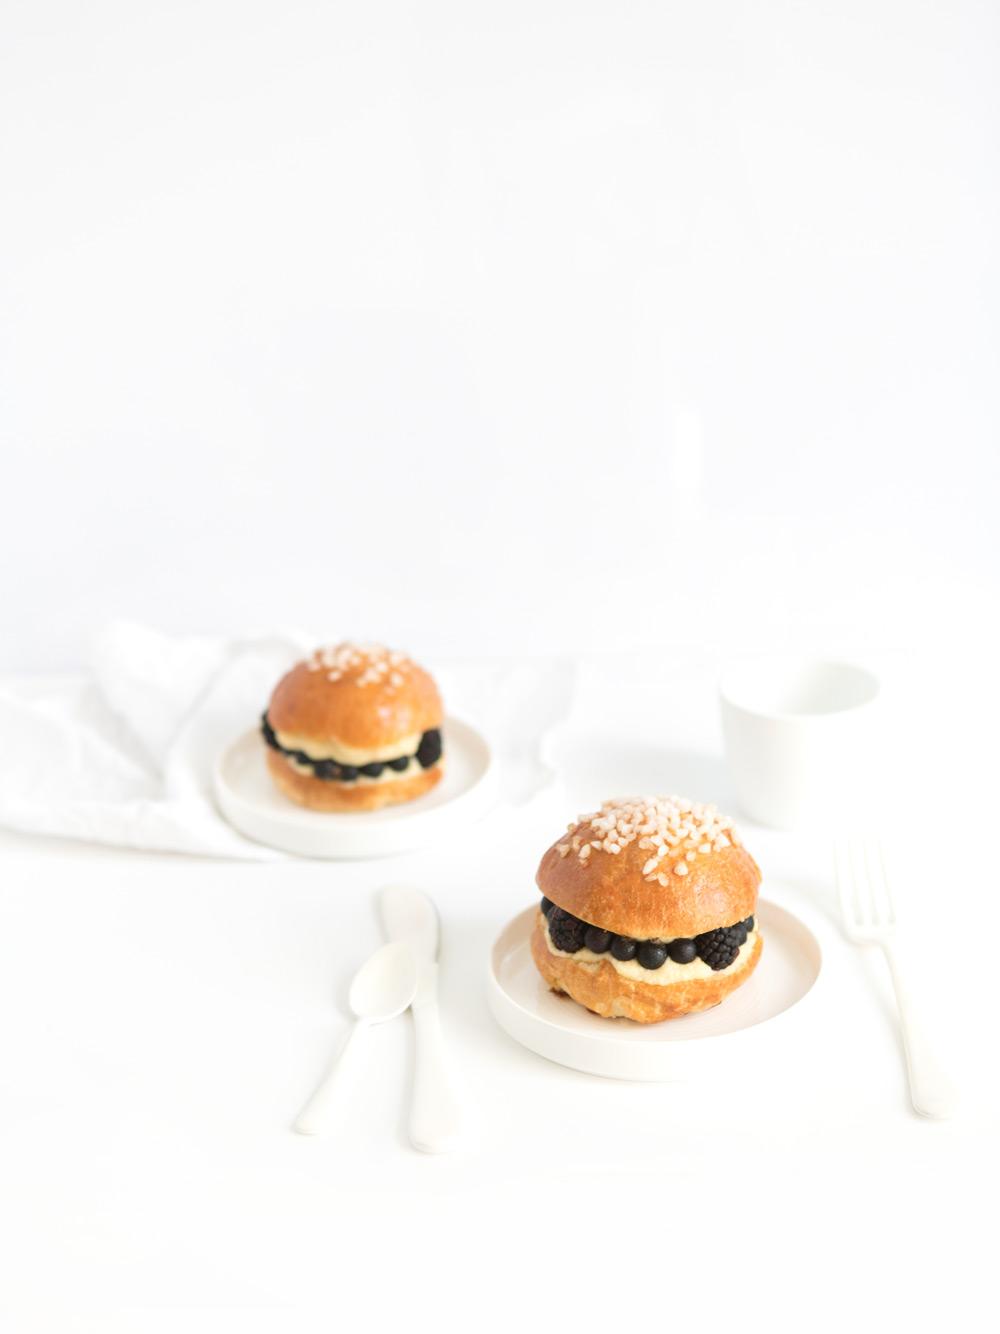 Blanccoco_Recette_Burgers_Dessert_Myrtilles_Mures_9